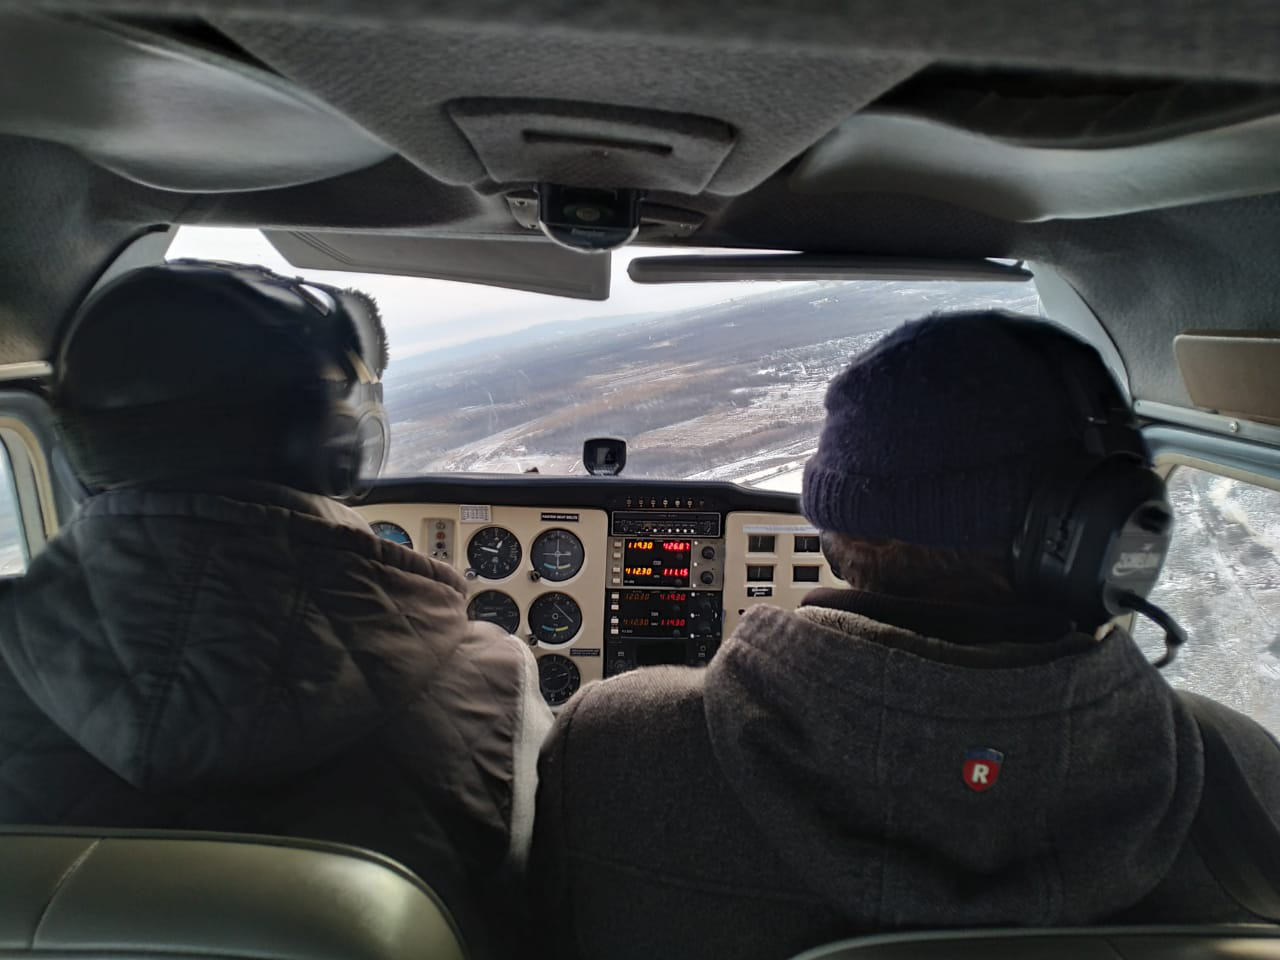 The first flight.